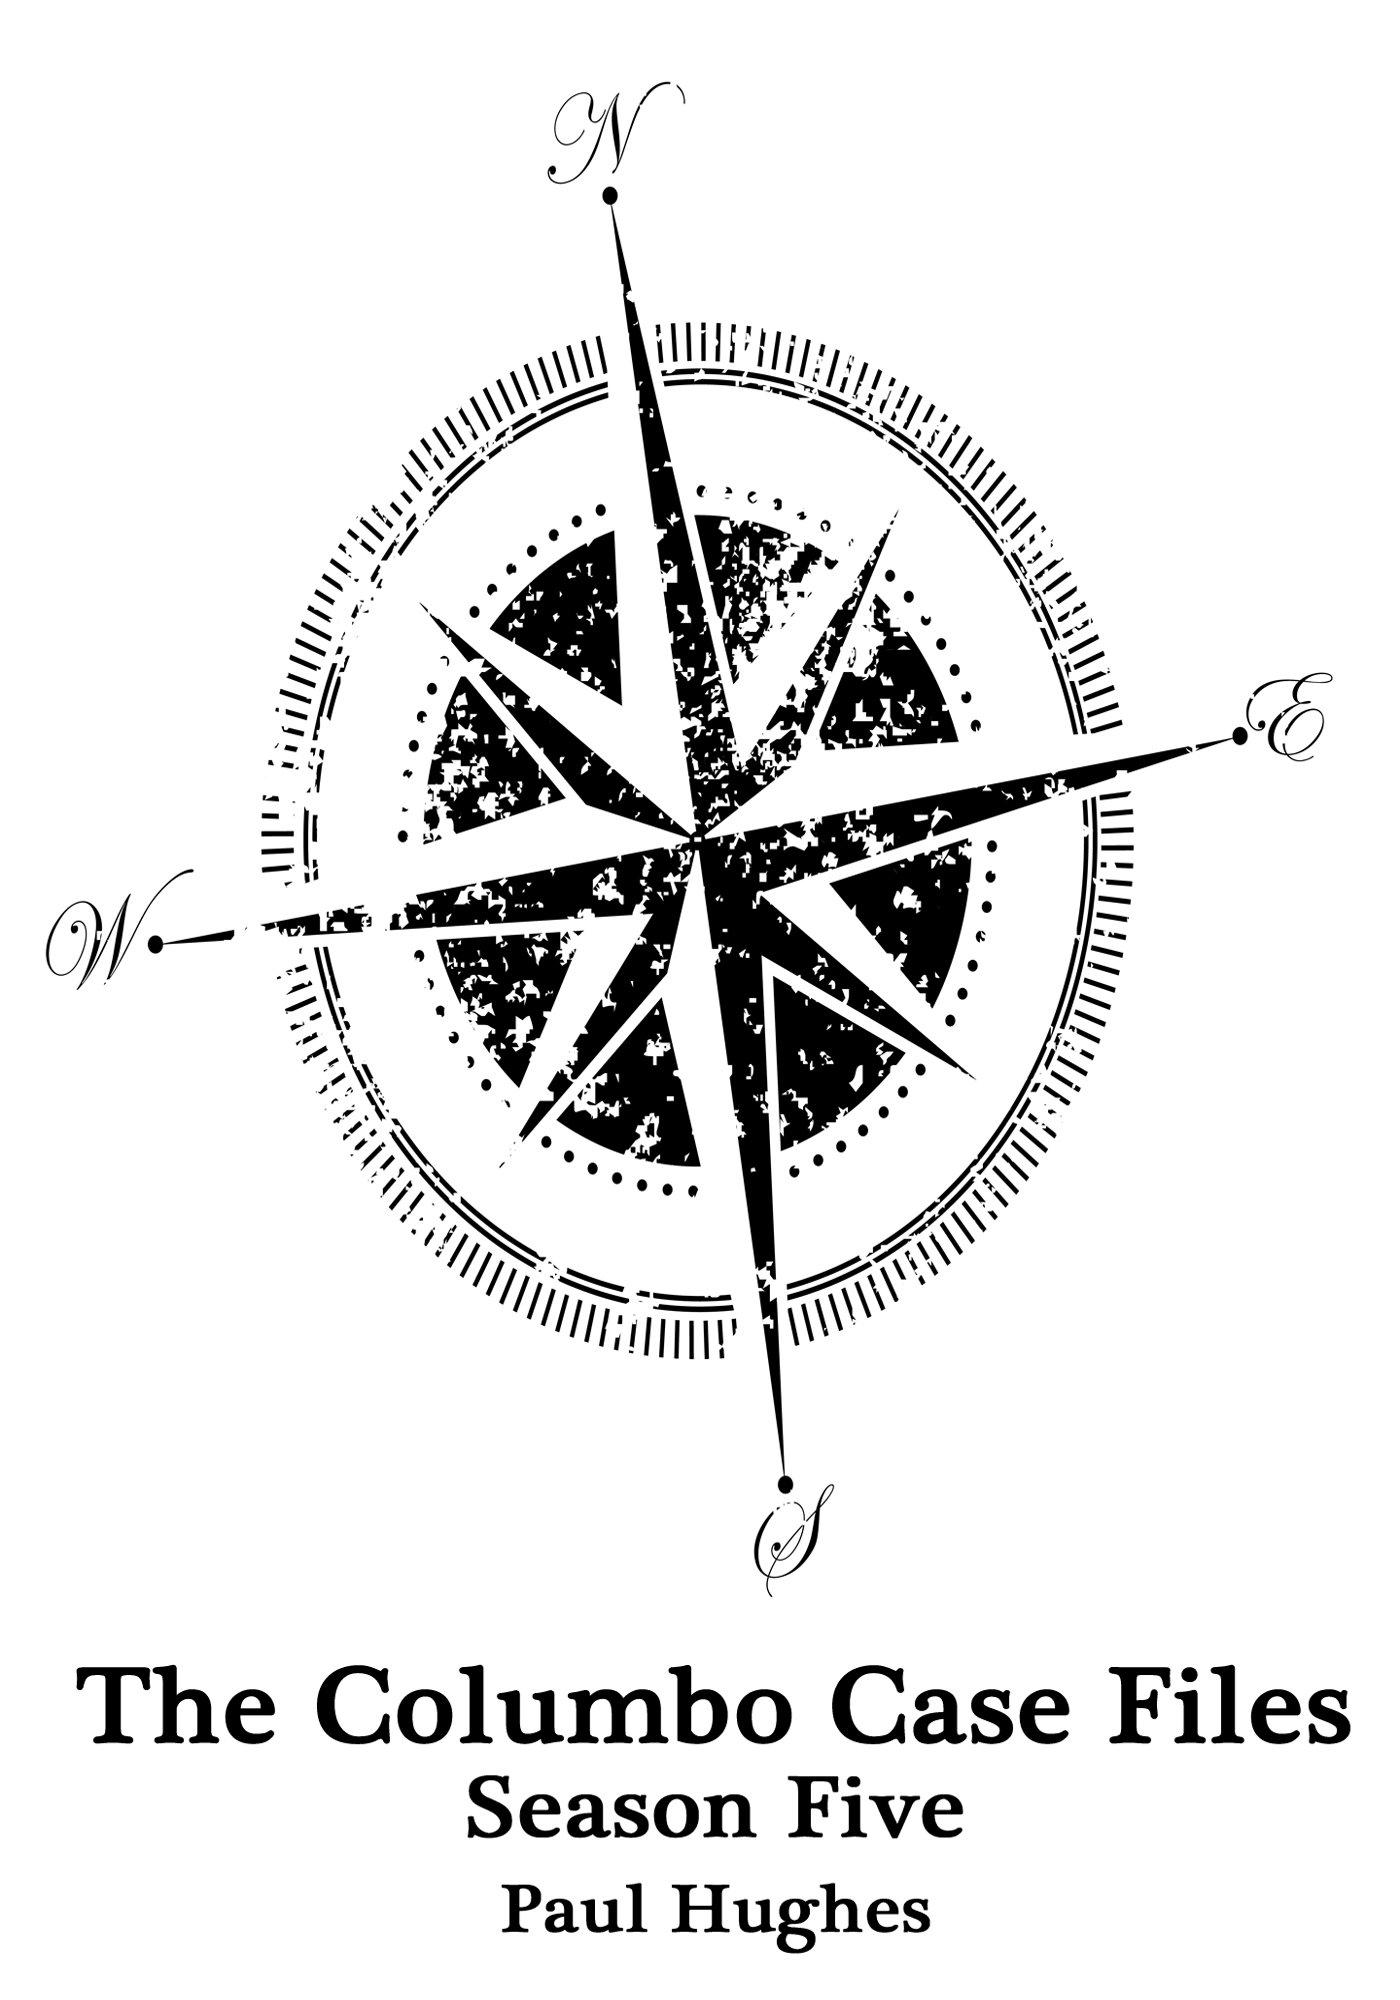 The Columbo Case Files Season Five